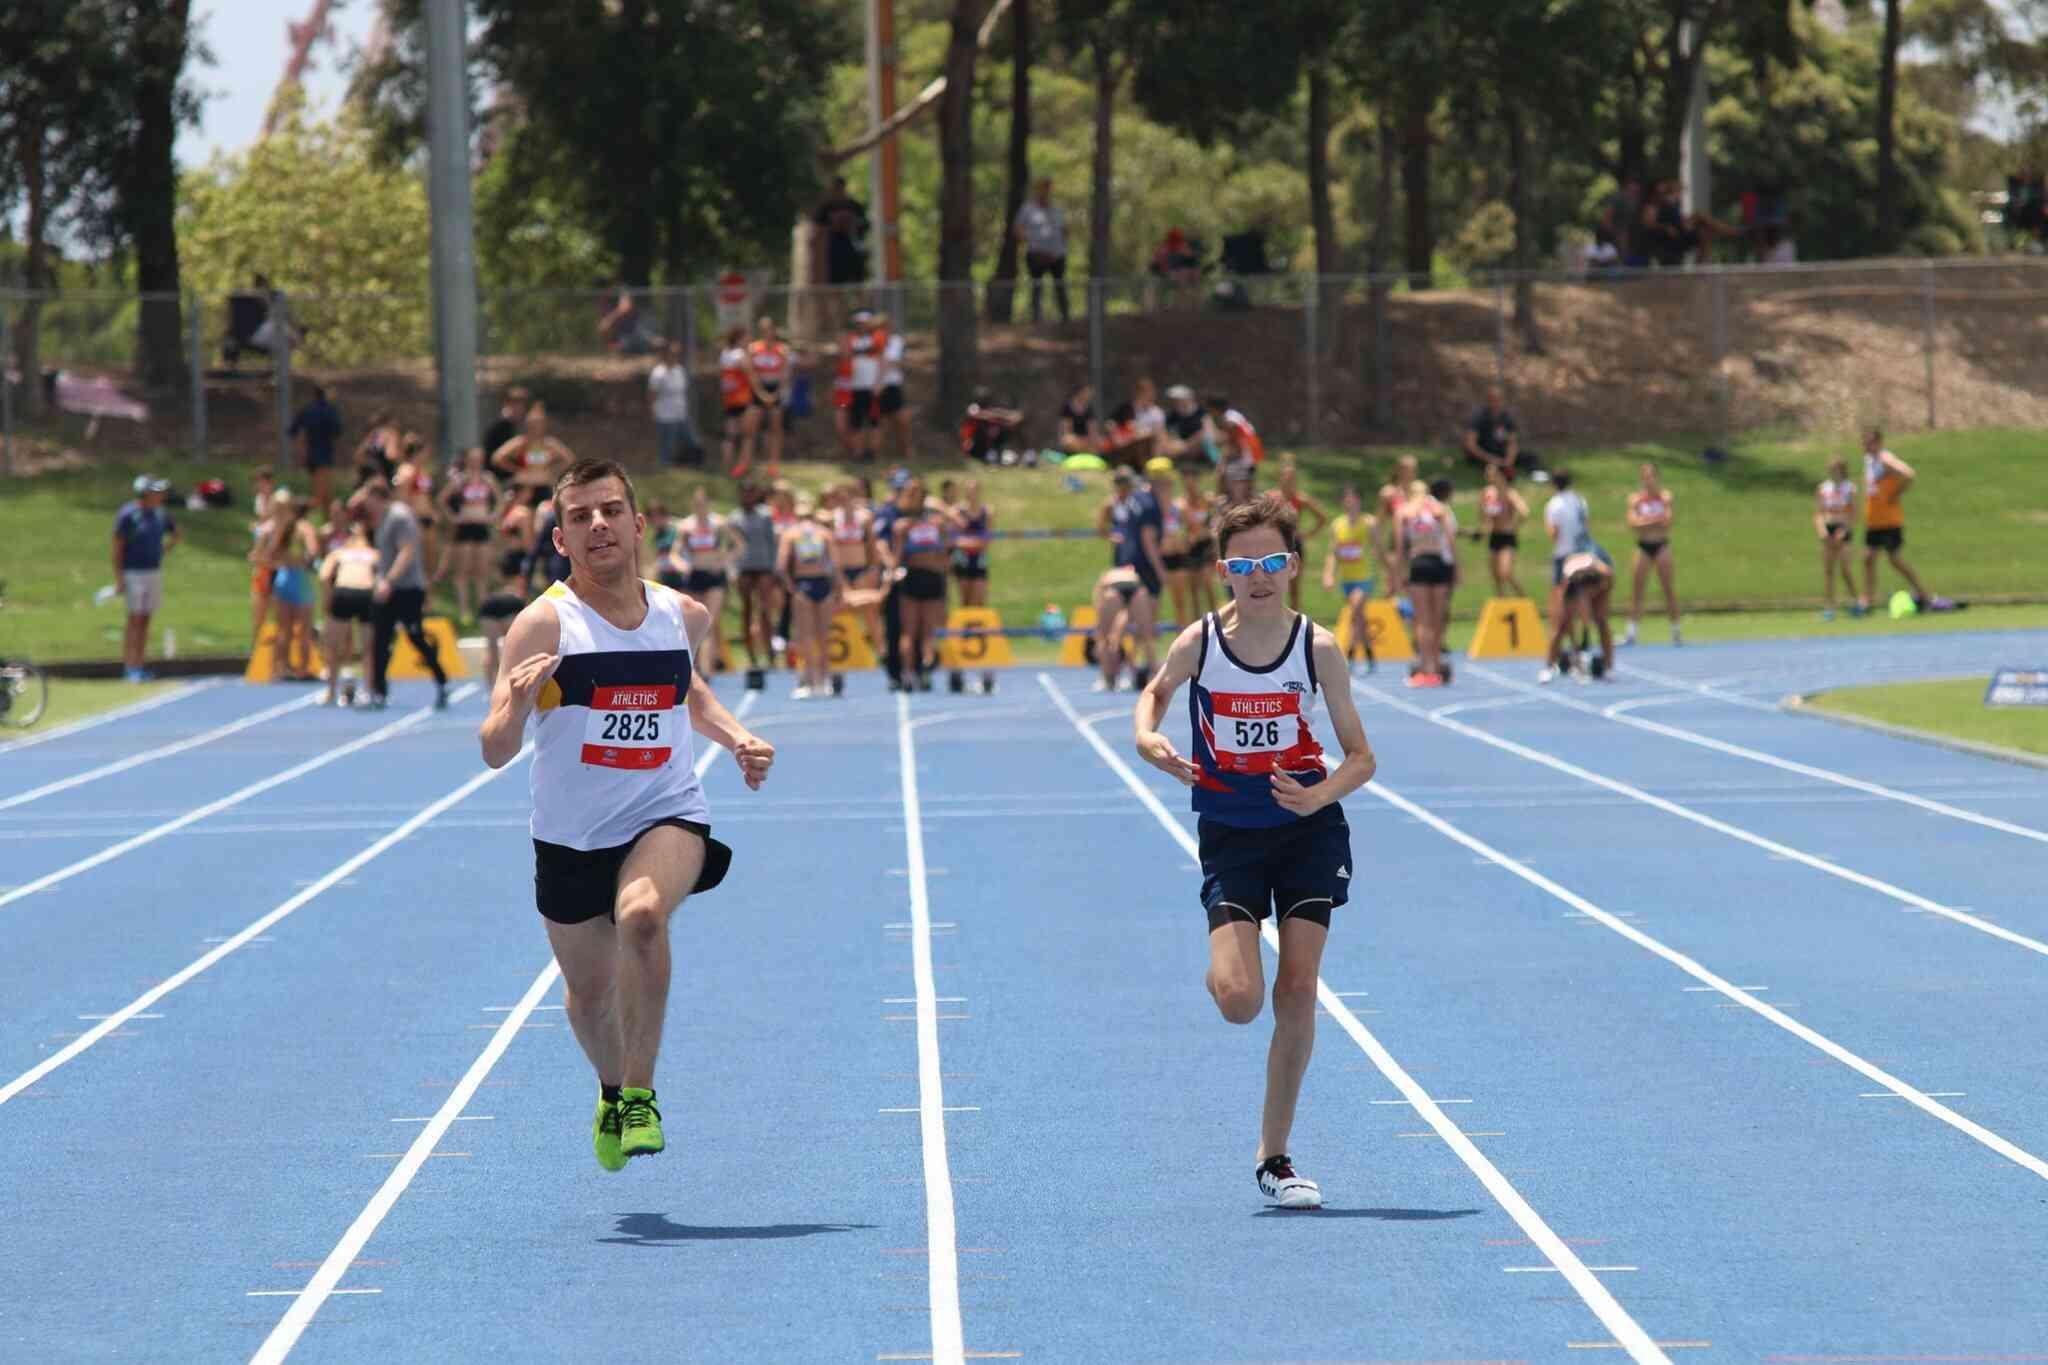 Interclub & NSW 3km Champs